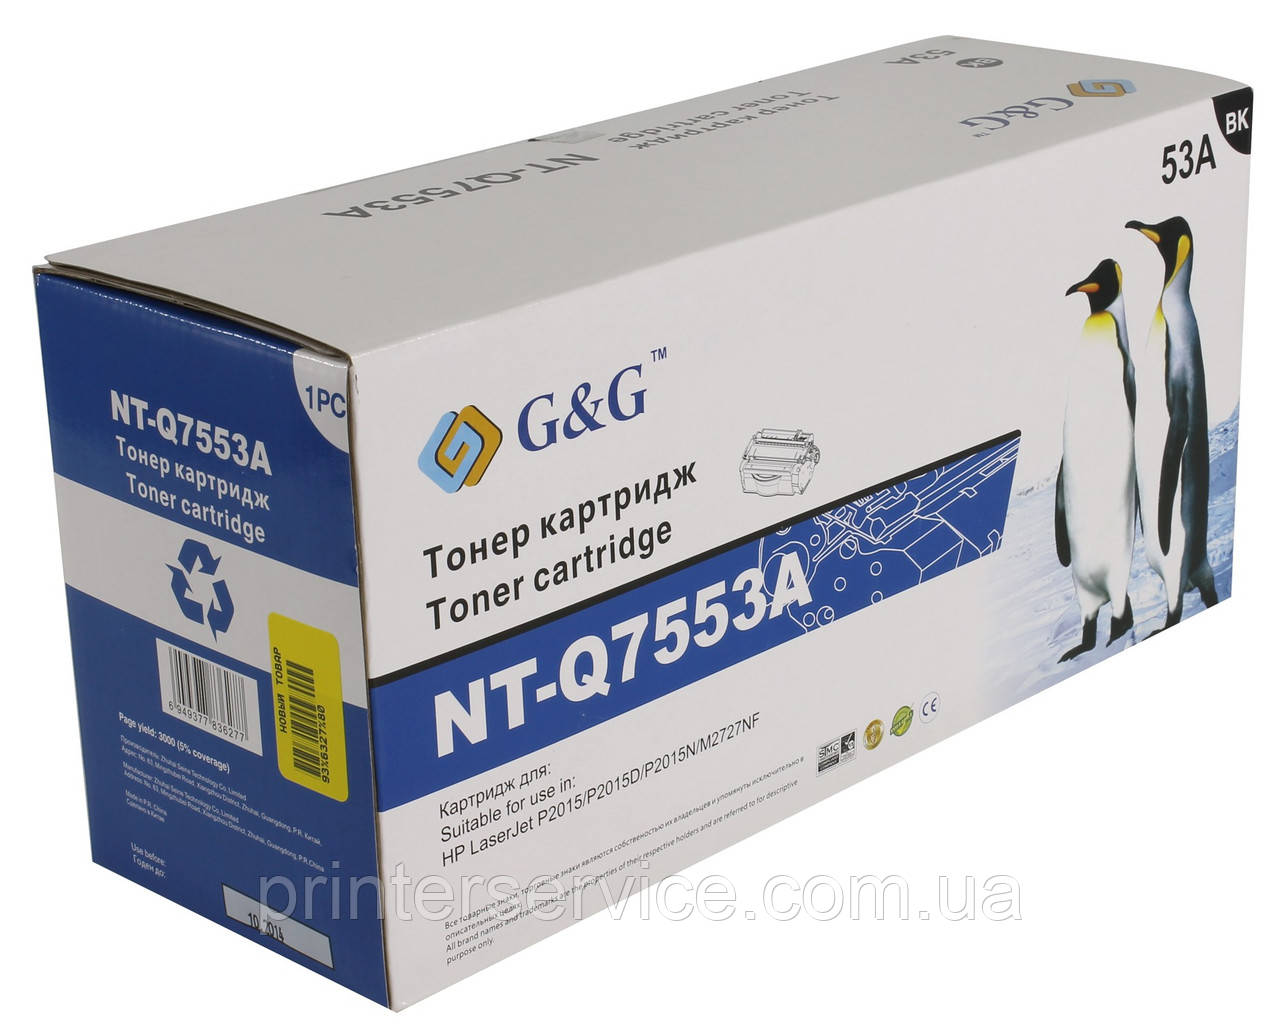 Картридж Q7553A совместимый для HP LJ P2015 M2727 series, G&G-Q7553A Black